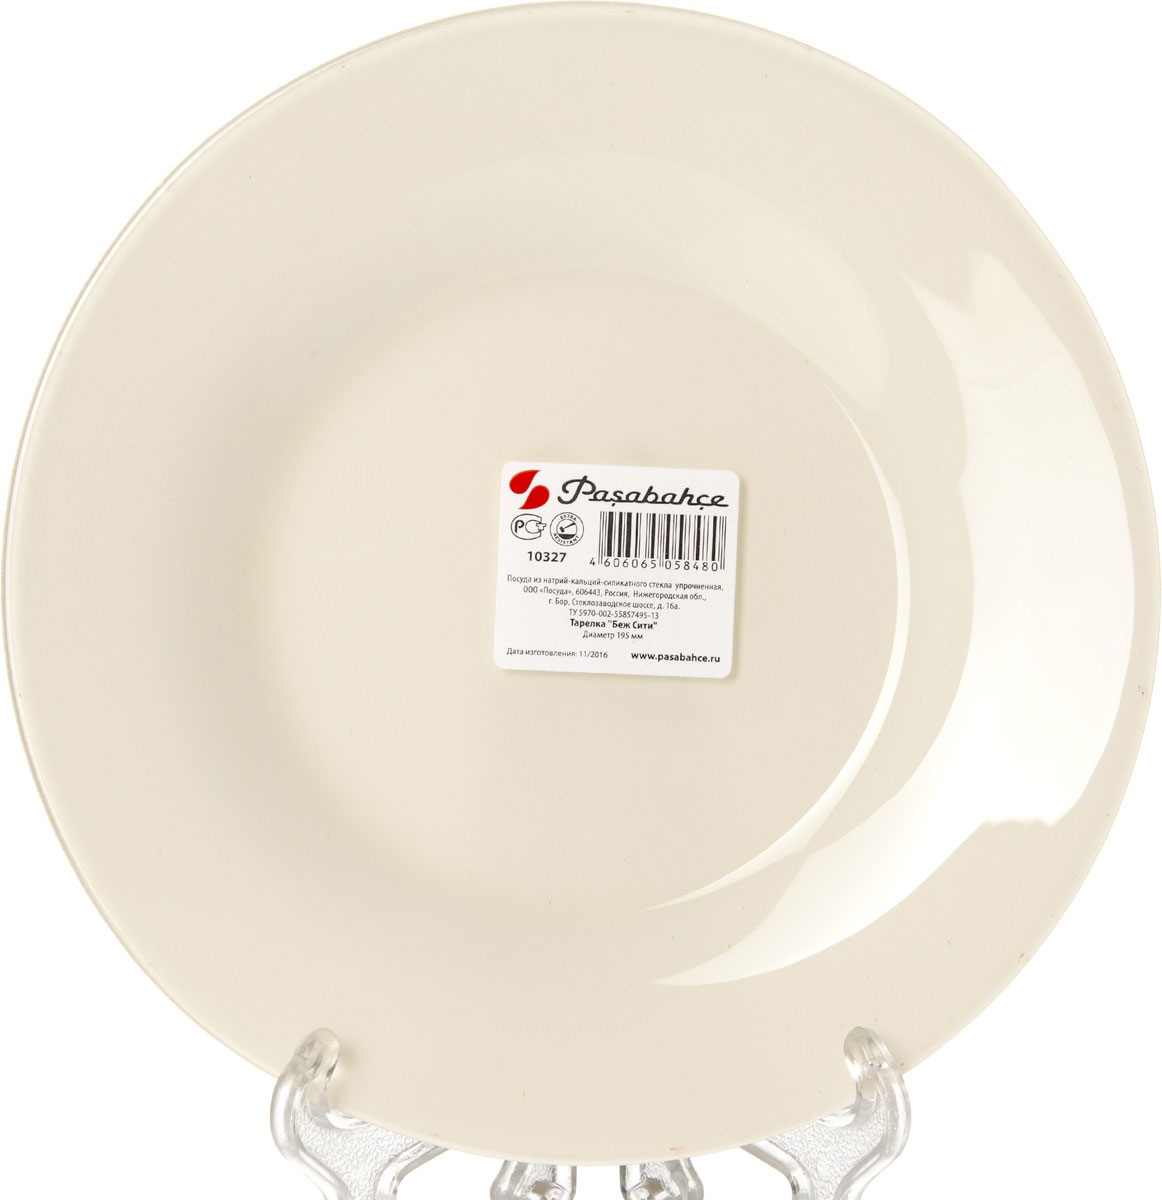 Тарелка Pasabahce Беж Сити, цвет: бежевый, диаметр 19,5 см тарелка pasabahce атлантис цвет прозрачный диаметр 21 см